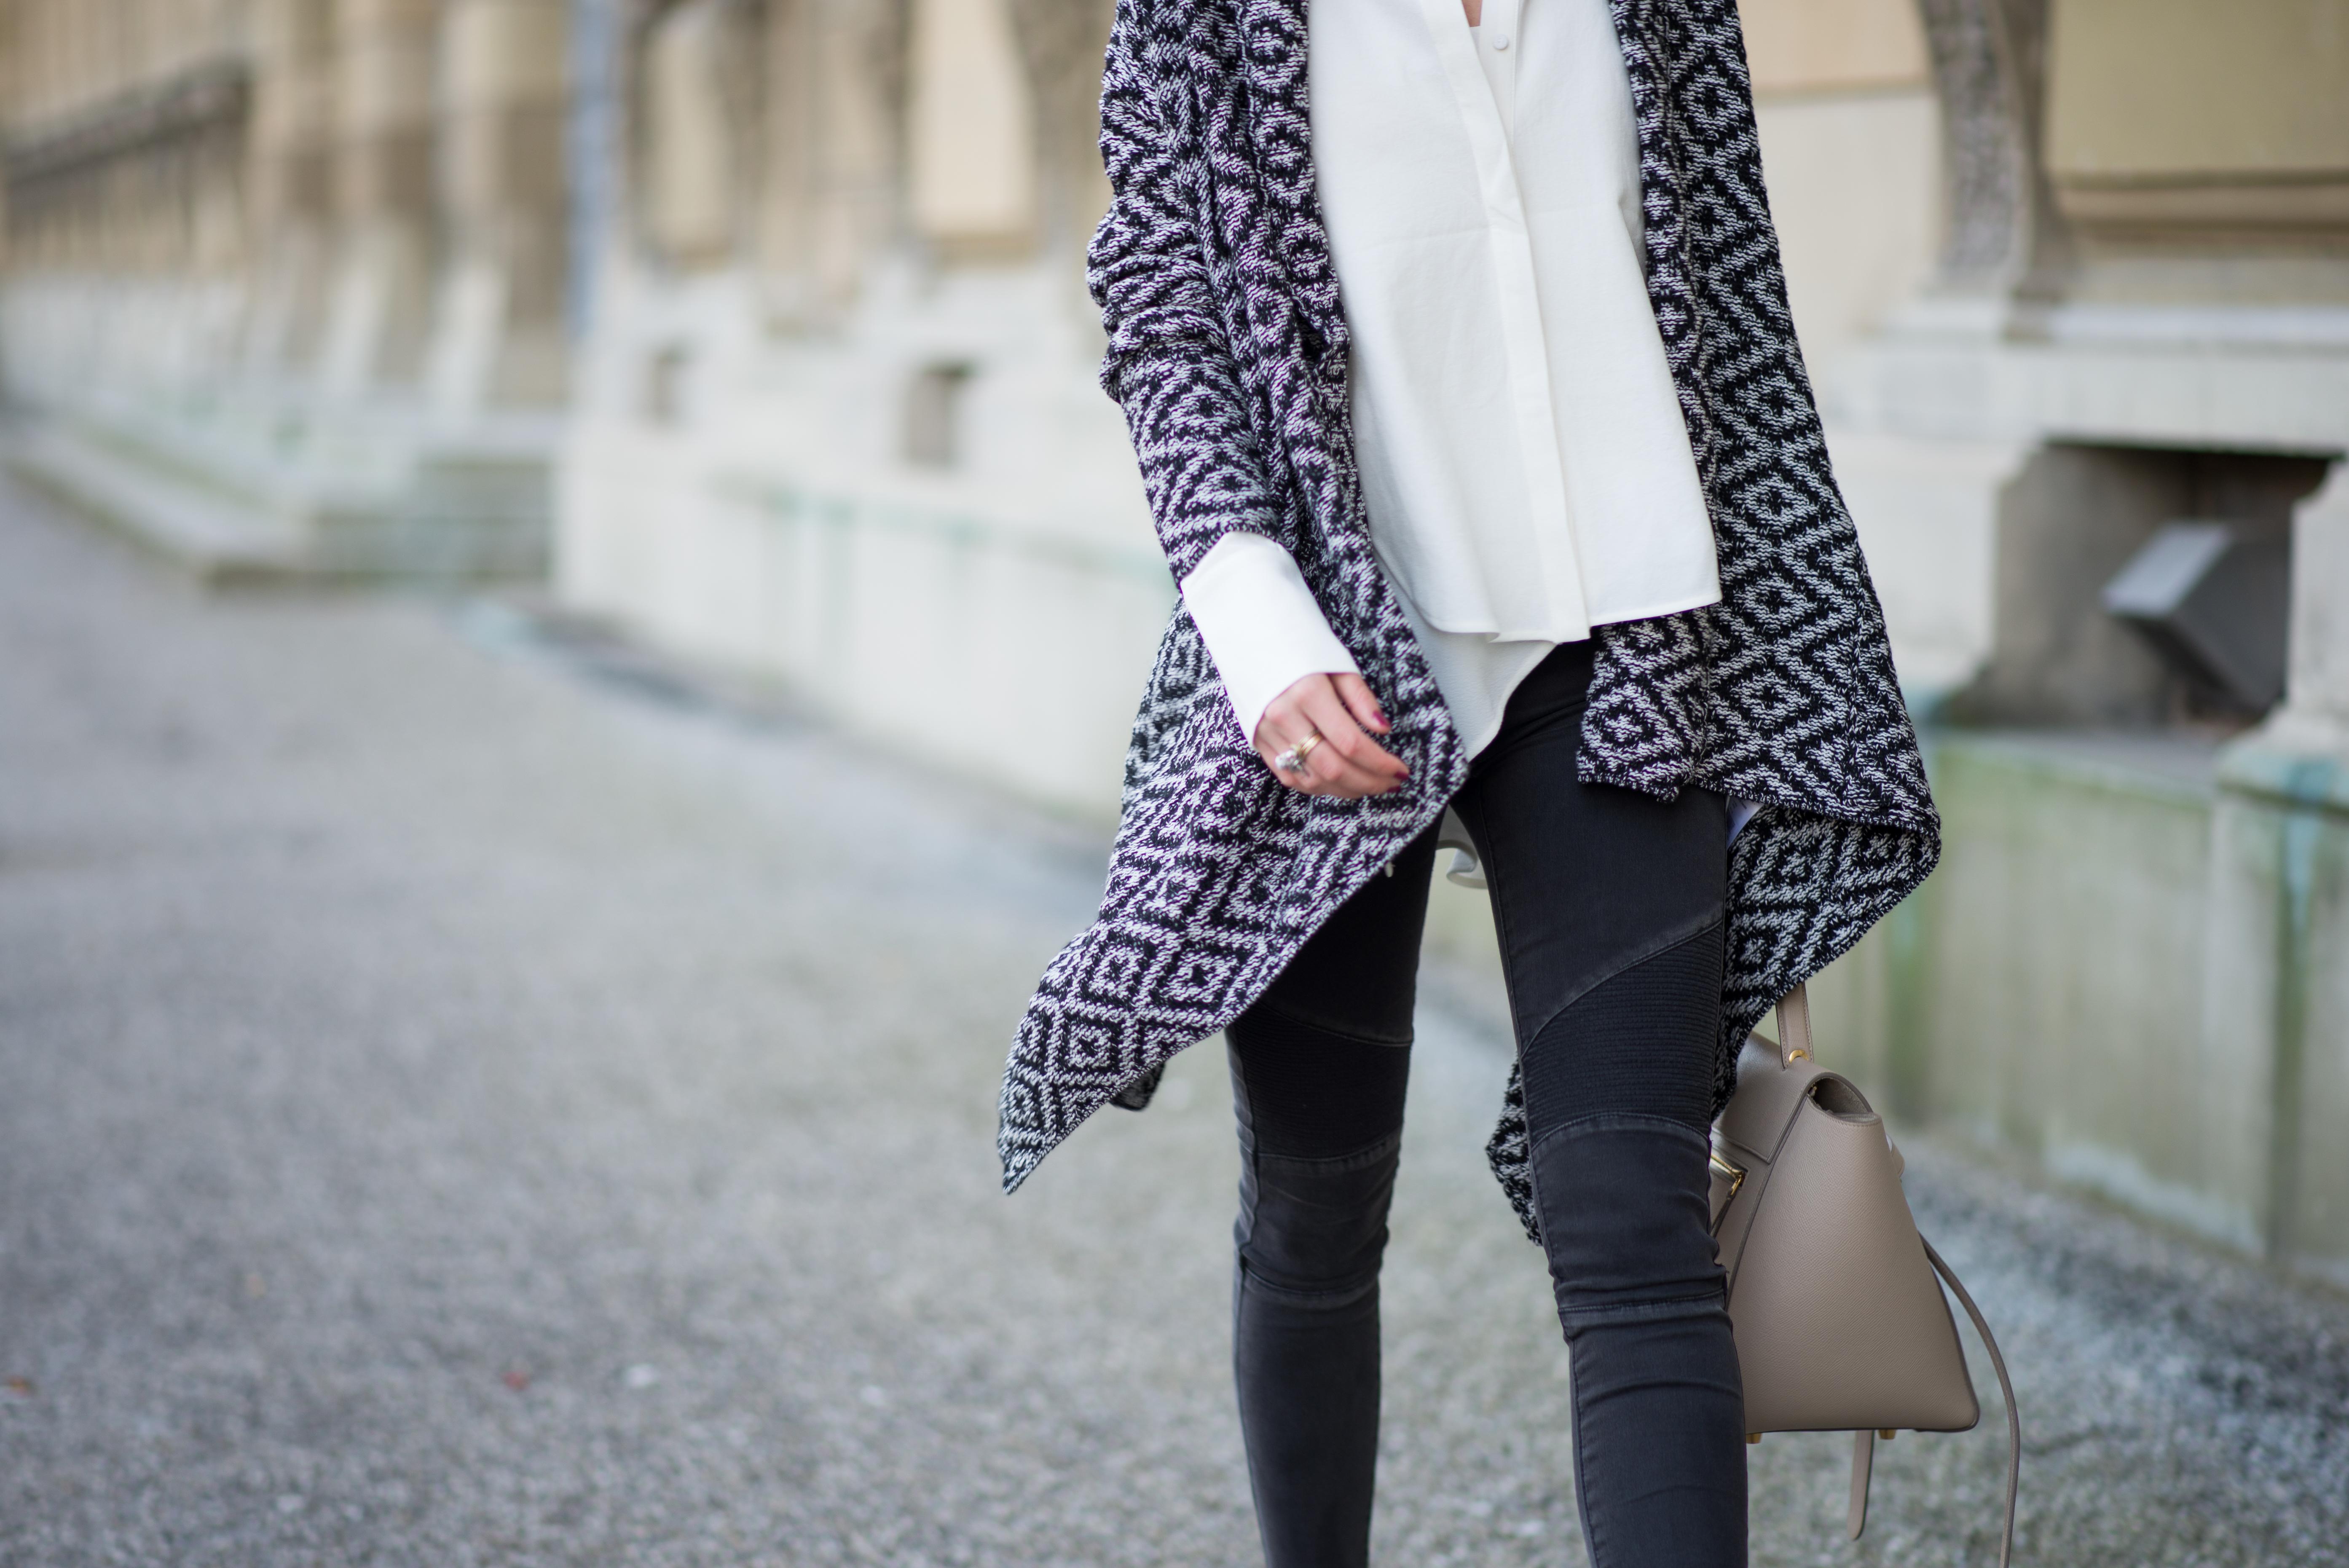 Fashionblog-Fashionblogger-Fashion-Blog-Blogger-Lifestyle-Céline_Belt_Bag-beige-REVIEW-Tom-Ford-Sonnenbrille-Cateye-Lindarella-13